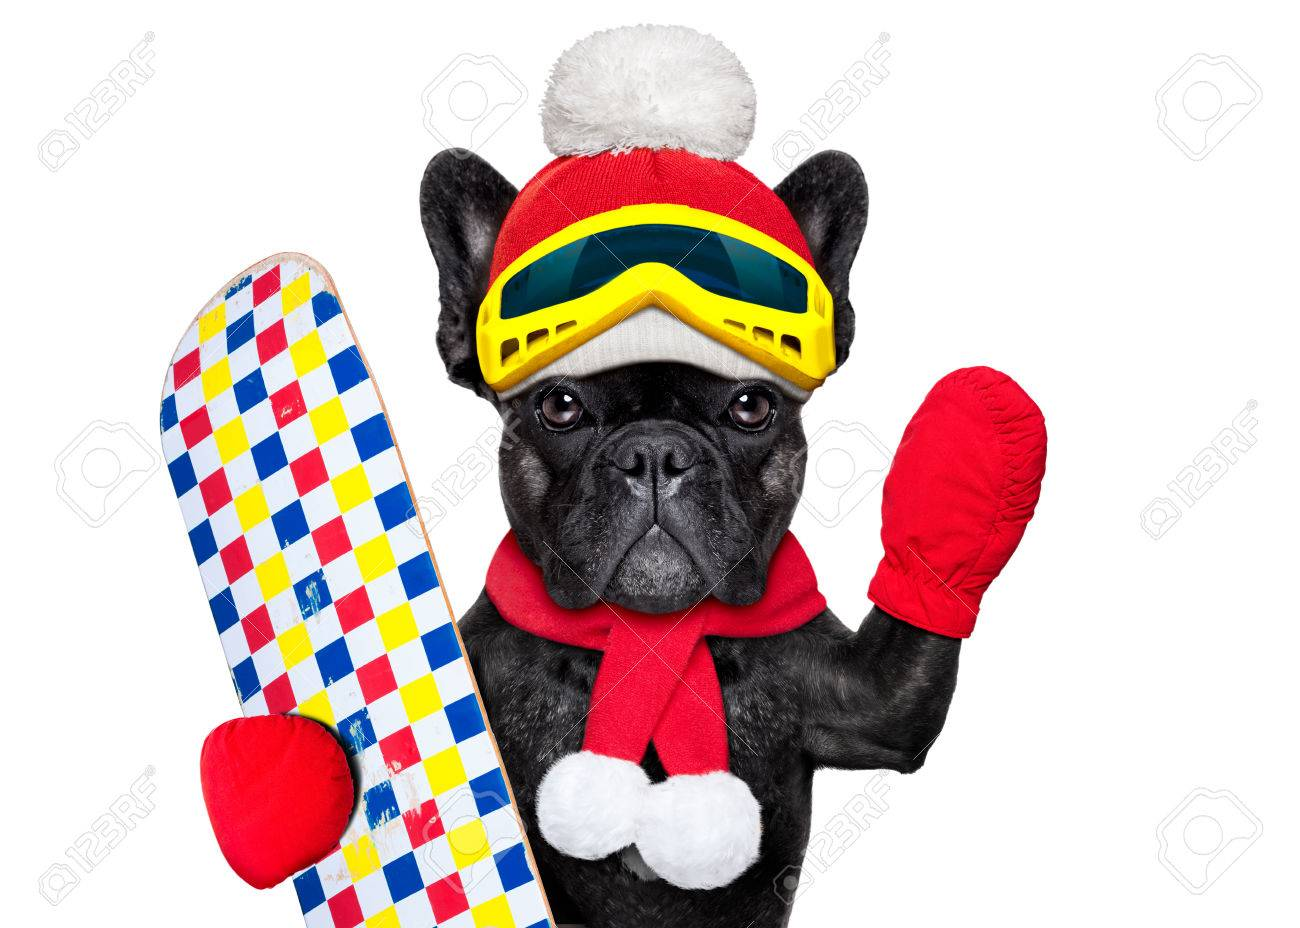 French Bulldog Dog With Ski